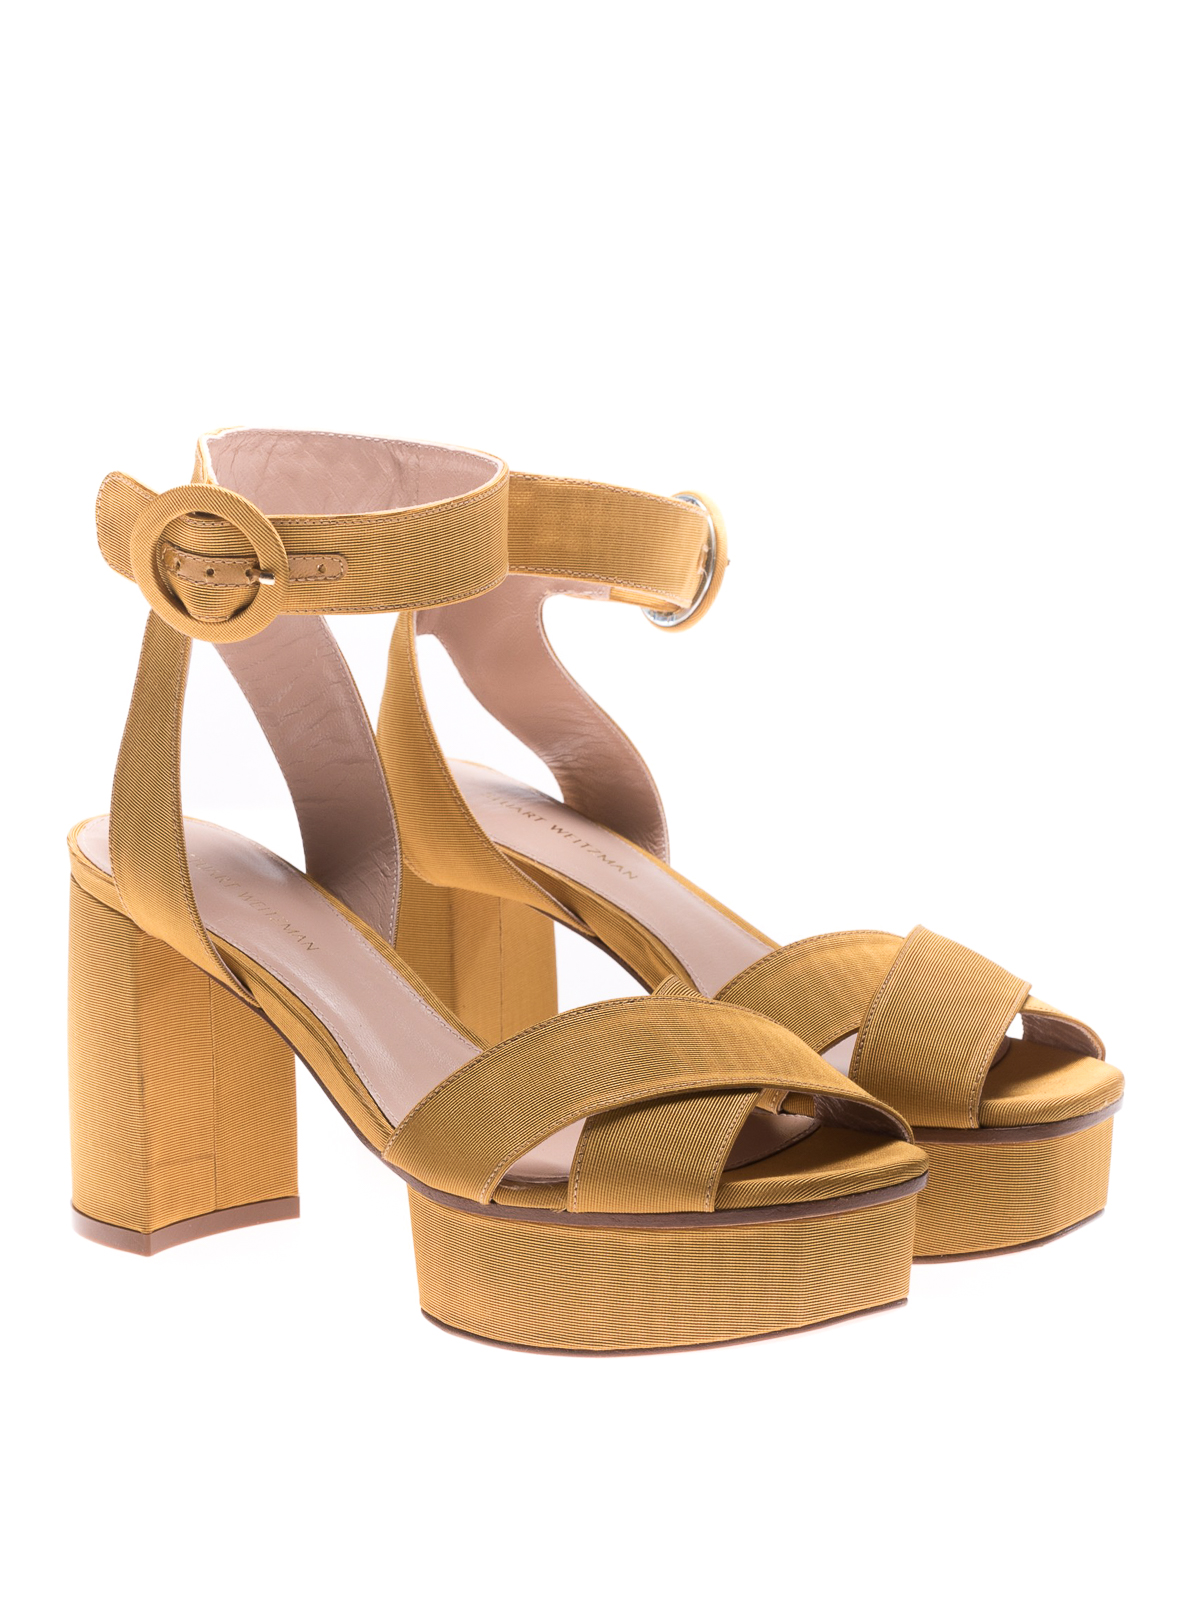 9d1123f210b6 Stuart Weitzman  sandals online - Carmina velvet platform sandals